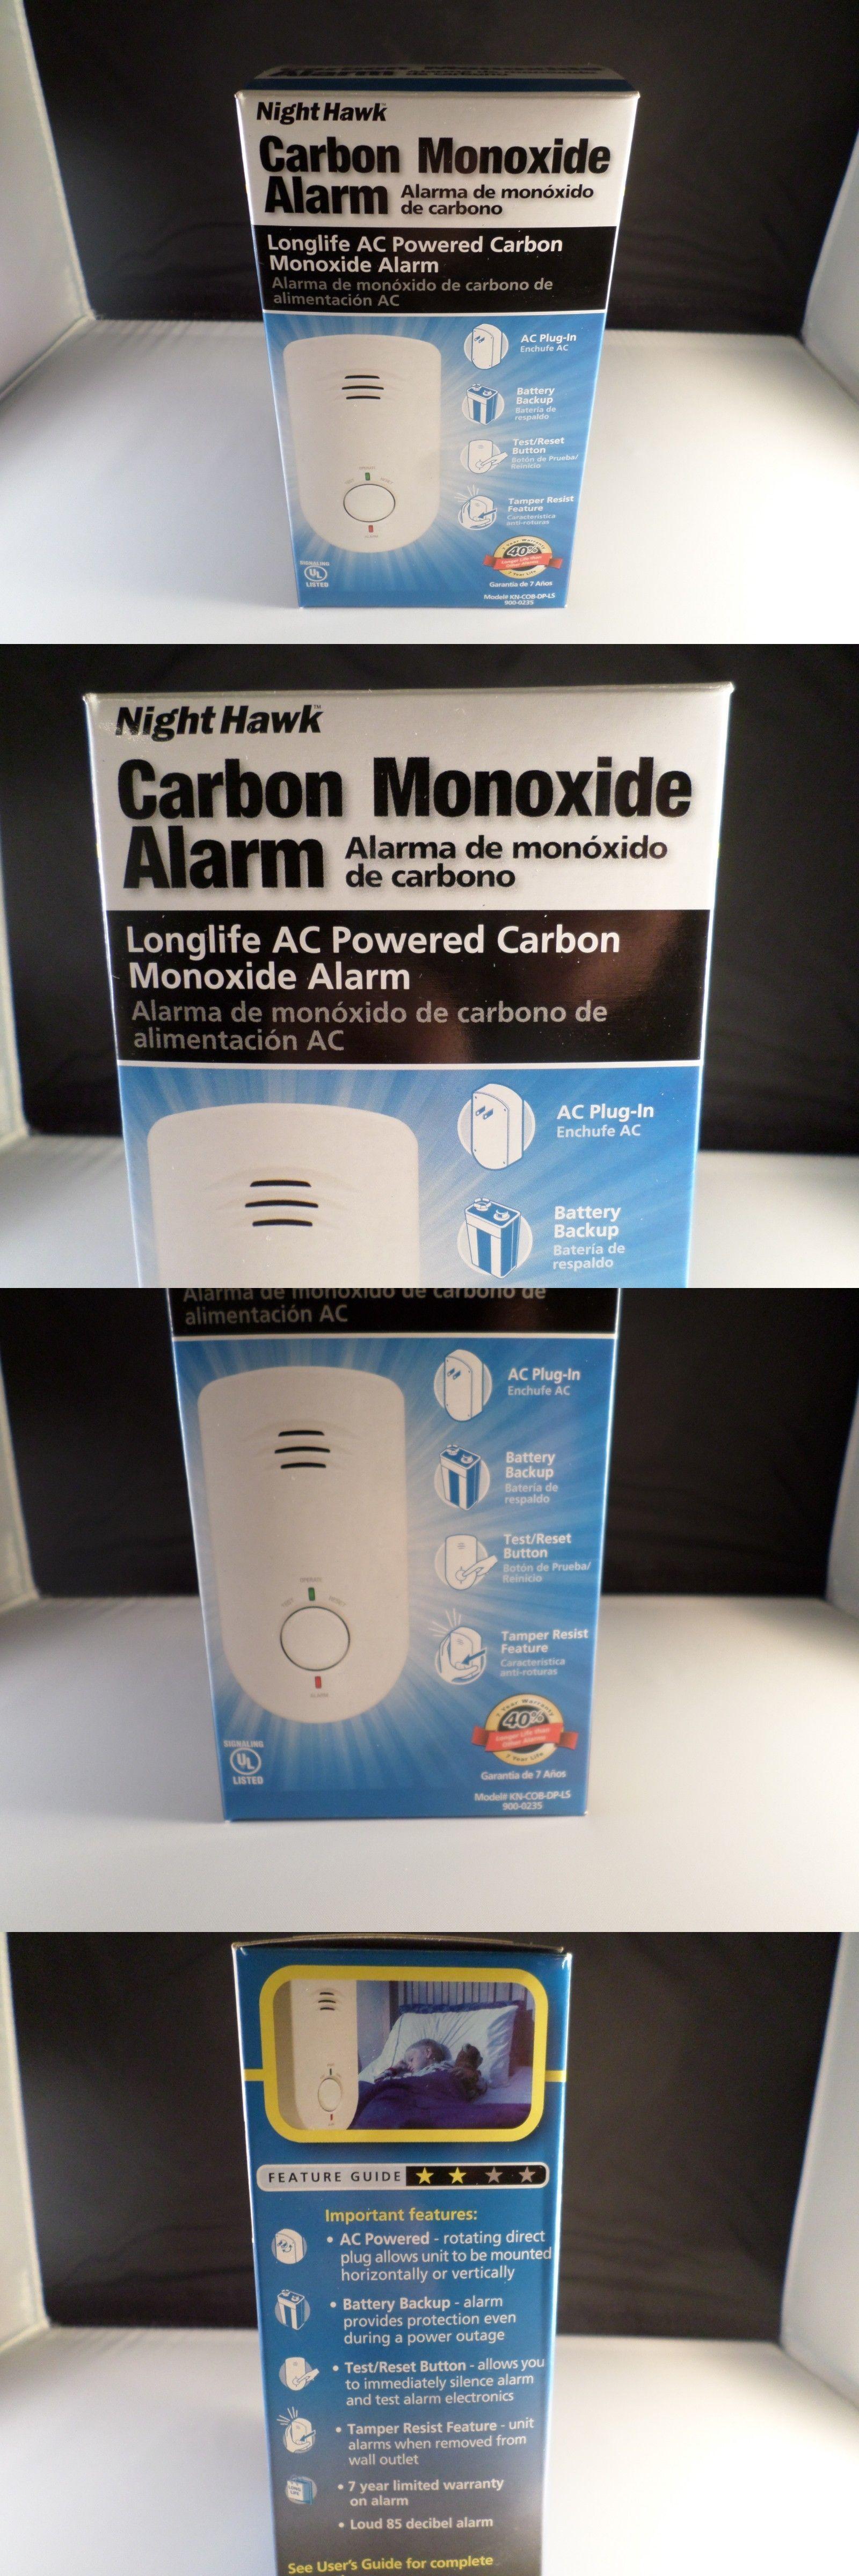 Long Life AC Powered with Battery Backup Kidde 900-0235 Nighthawk Carbon Monoxide Alarm